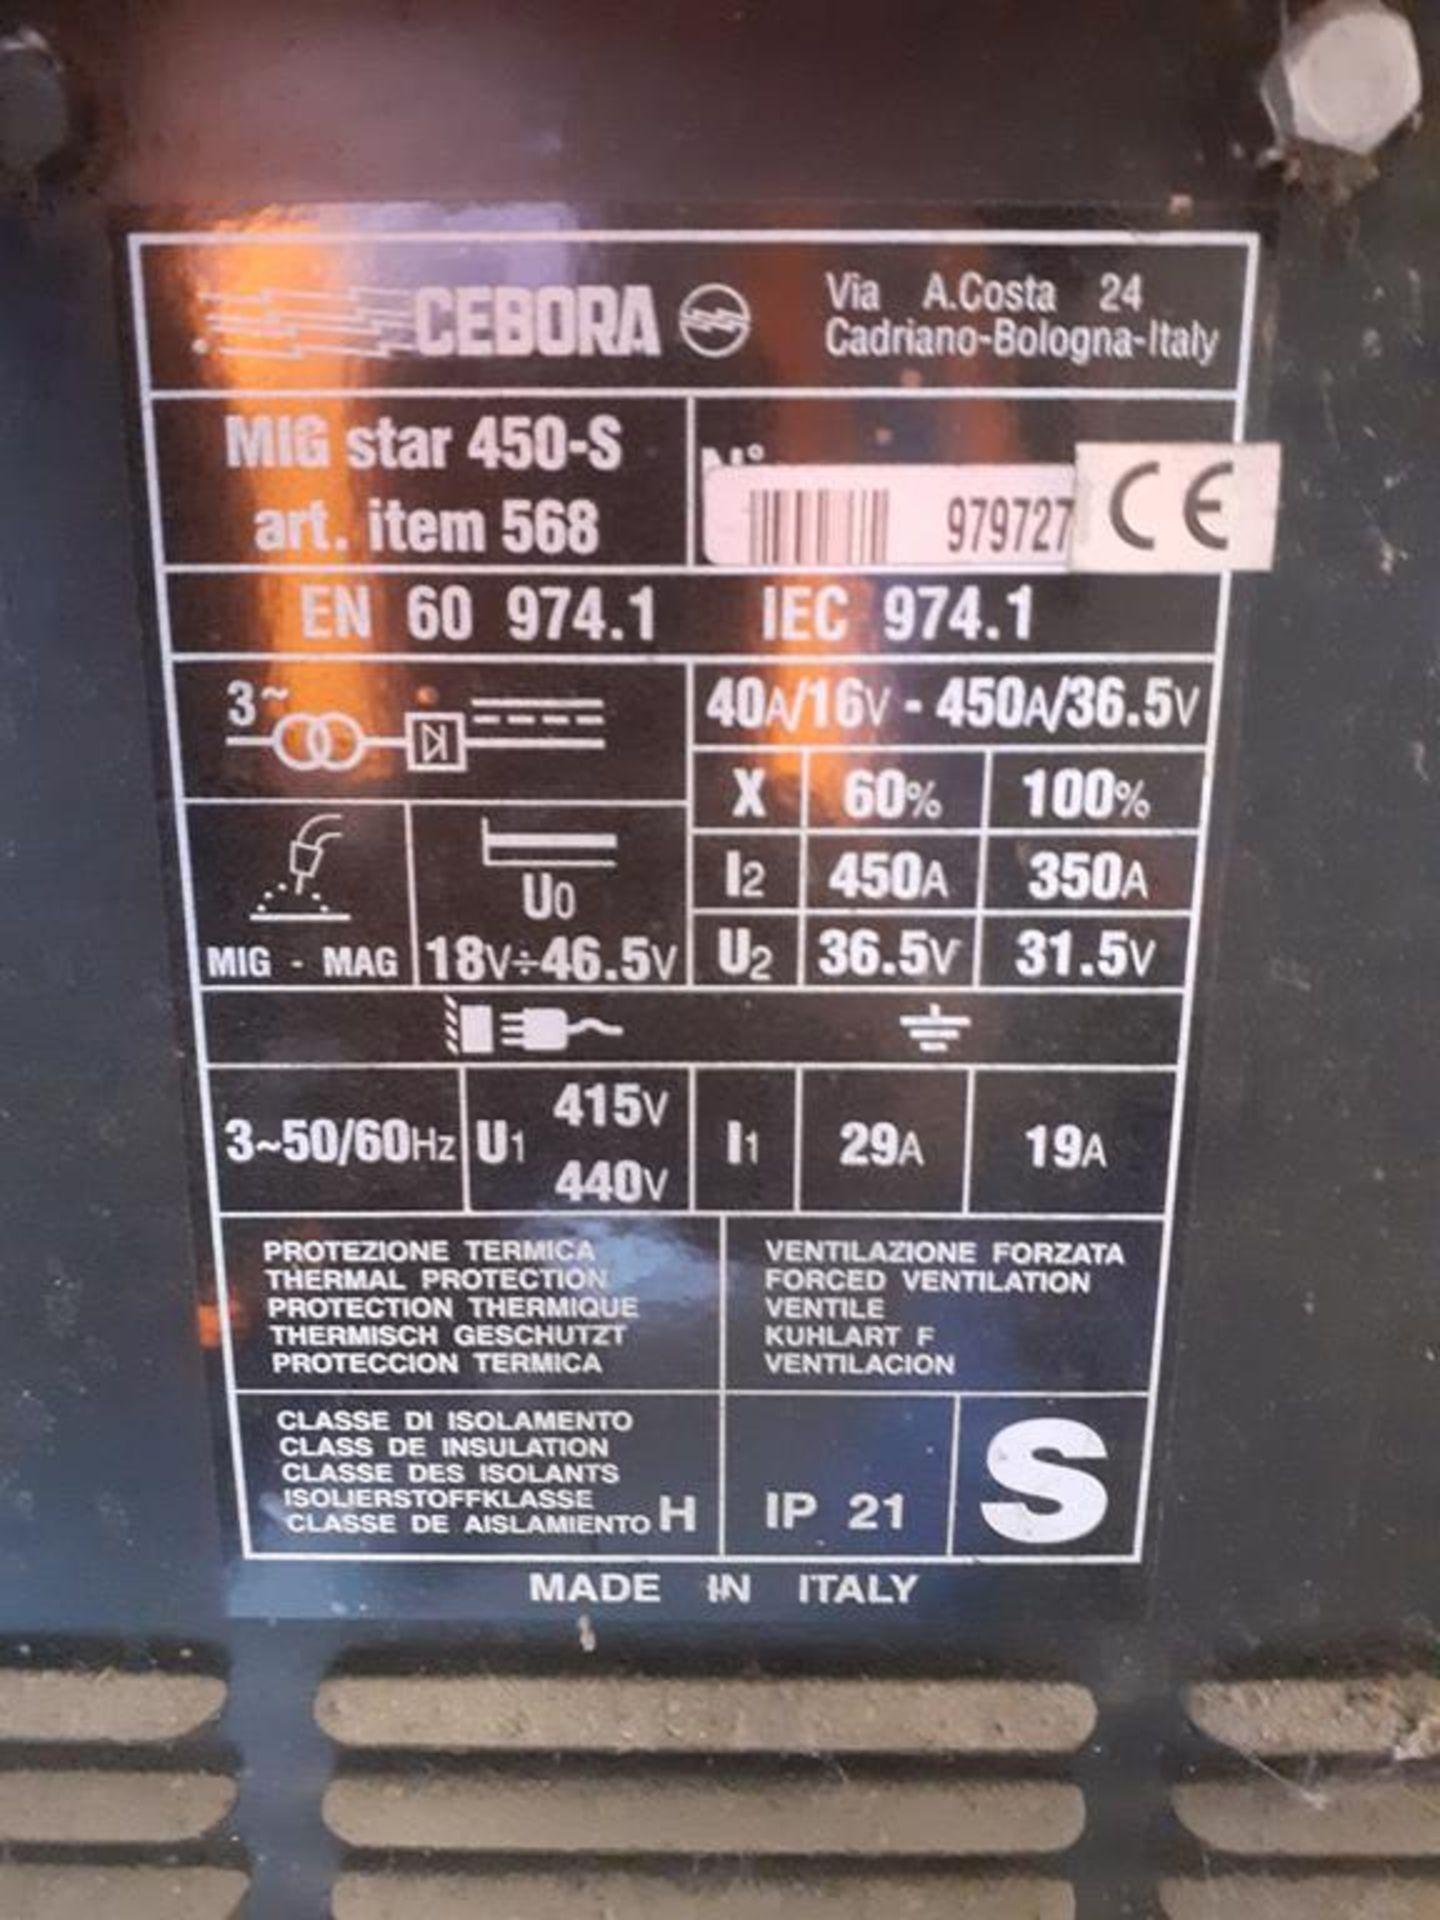 Cebora MIG Star 450-S Mig welder - Image 2 of 2